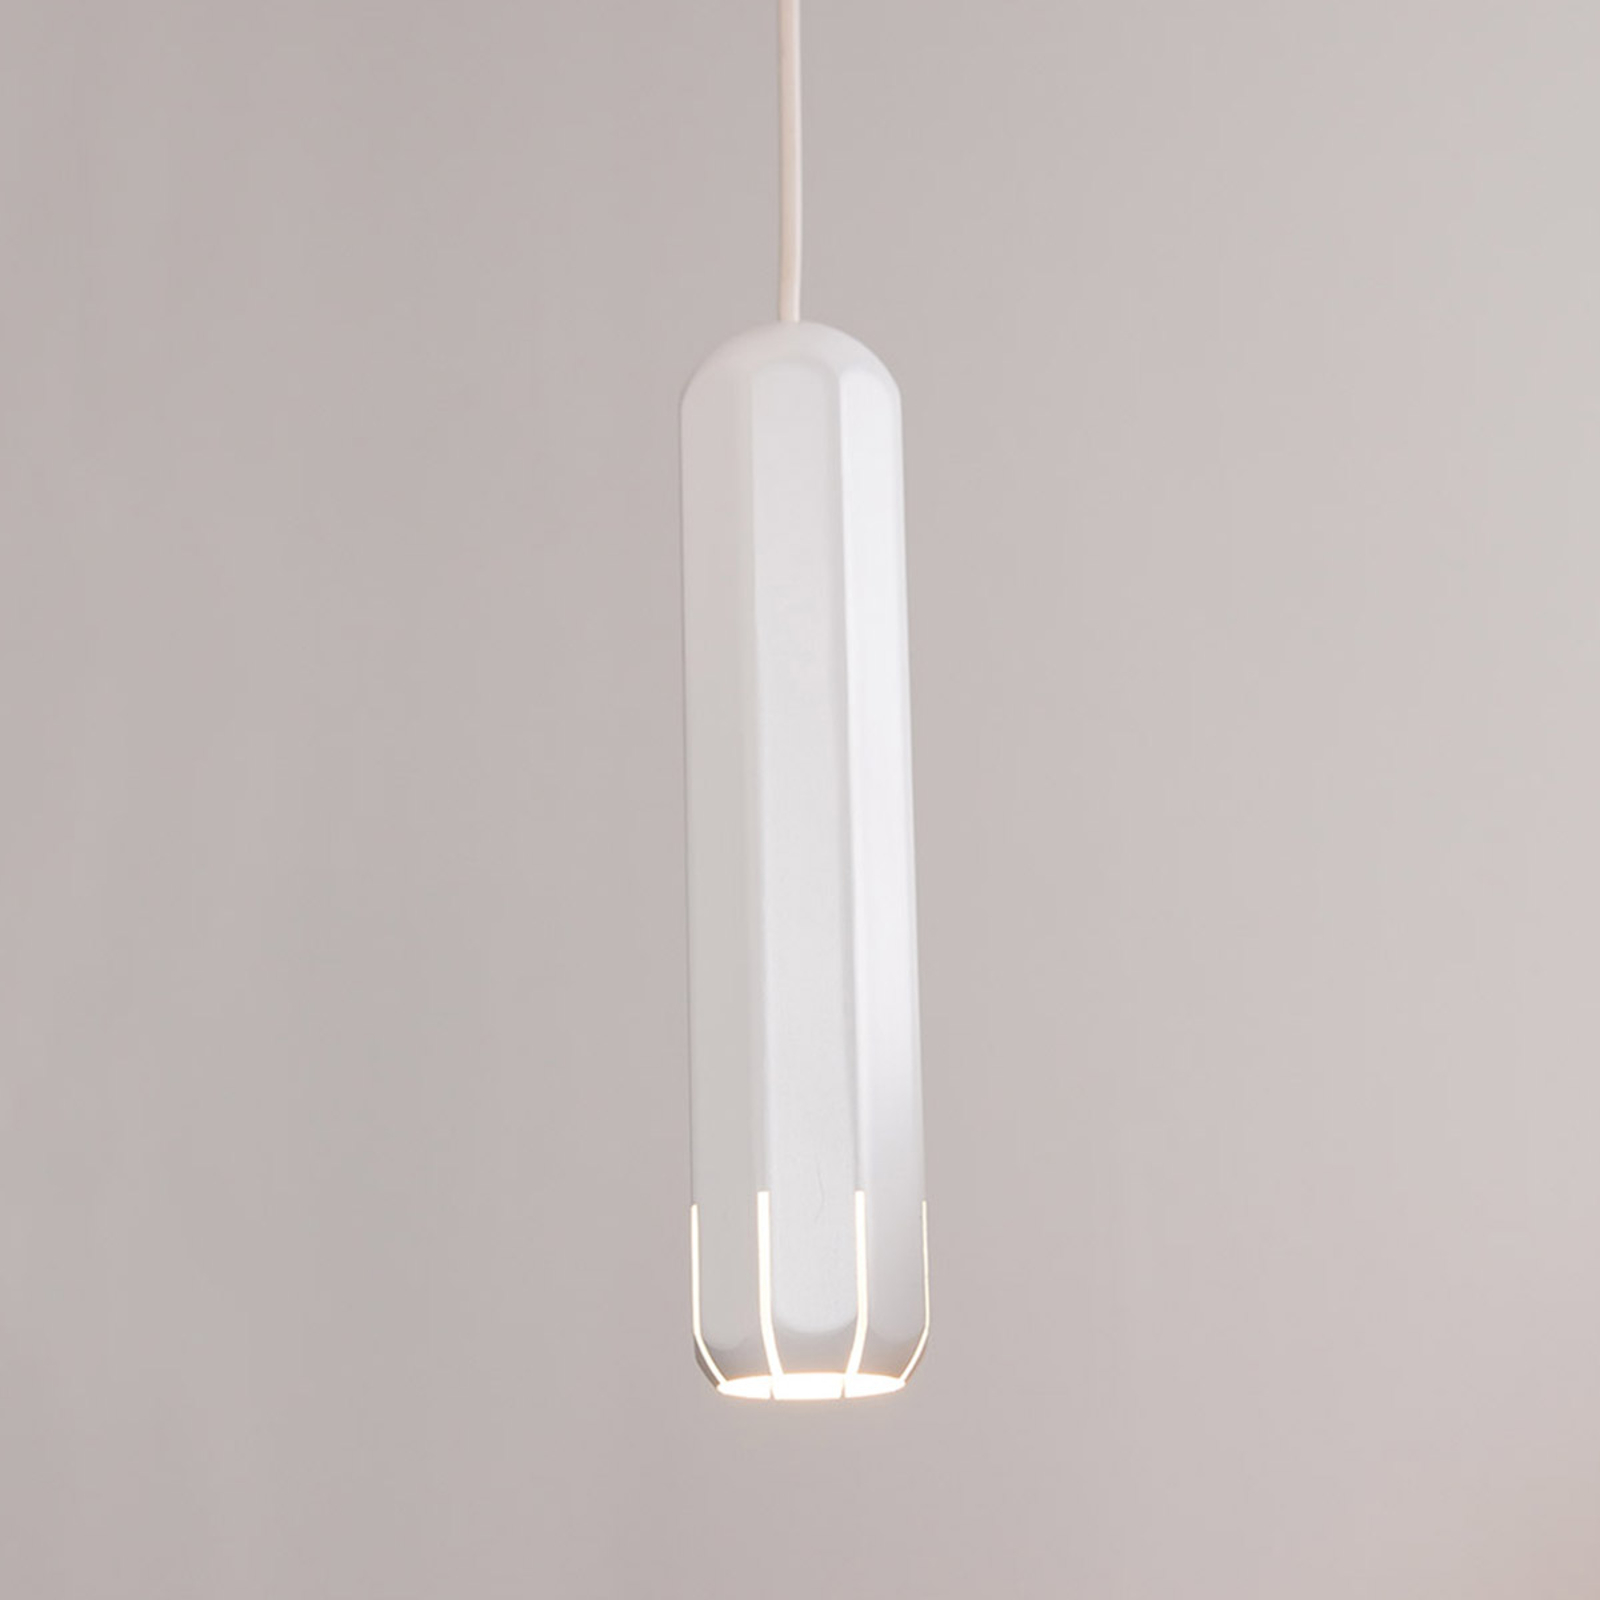 Innermost Brixton spot 20 LED hanglamp, wit